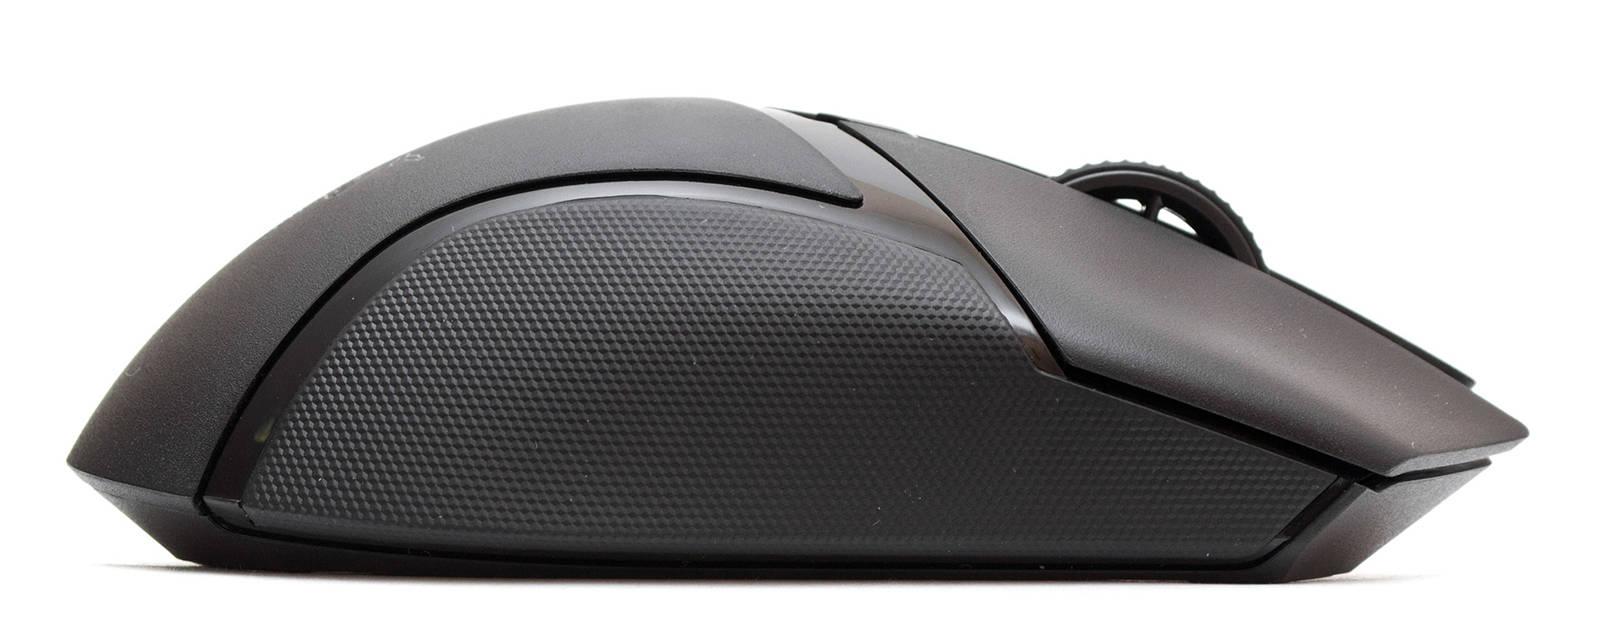 Мышка Razer Basilisk X HyperSpeed. Фото 8